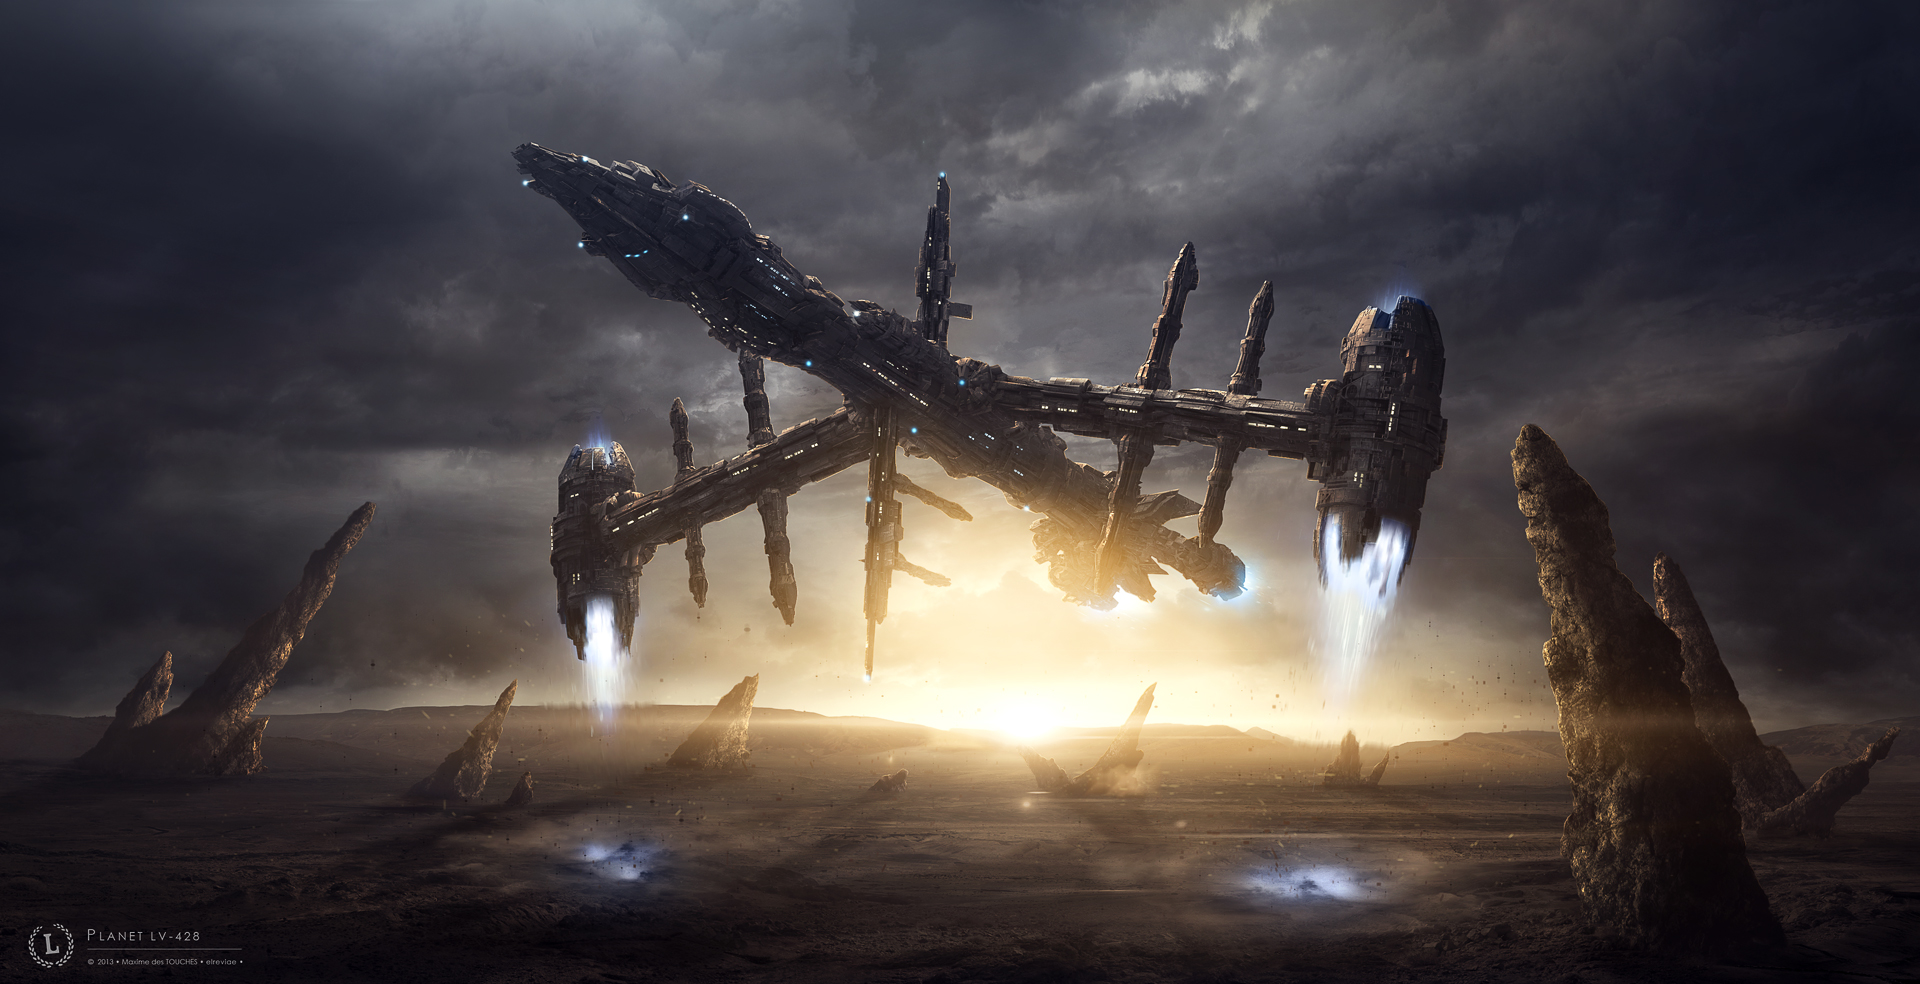 Planet LV-428 science fiction artwork